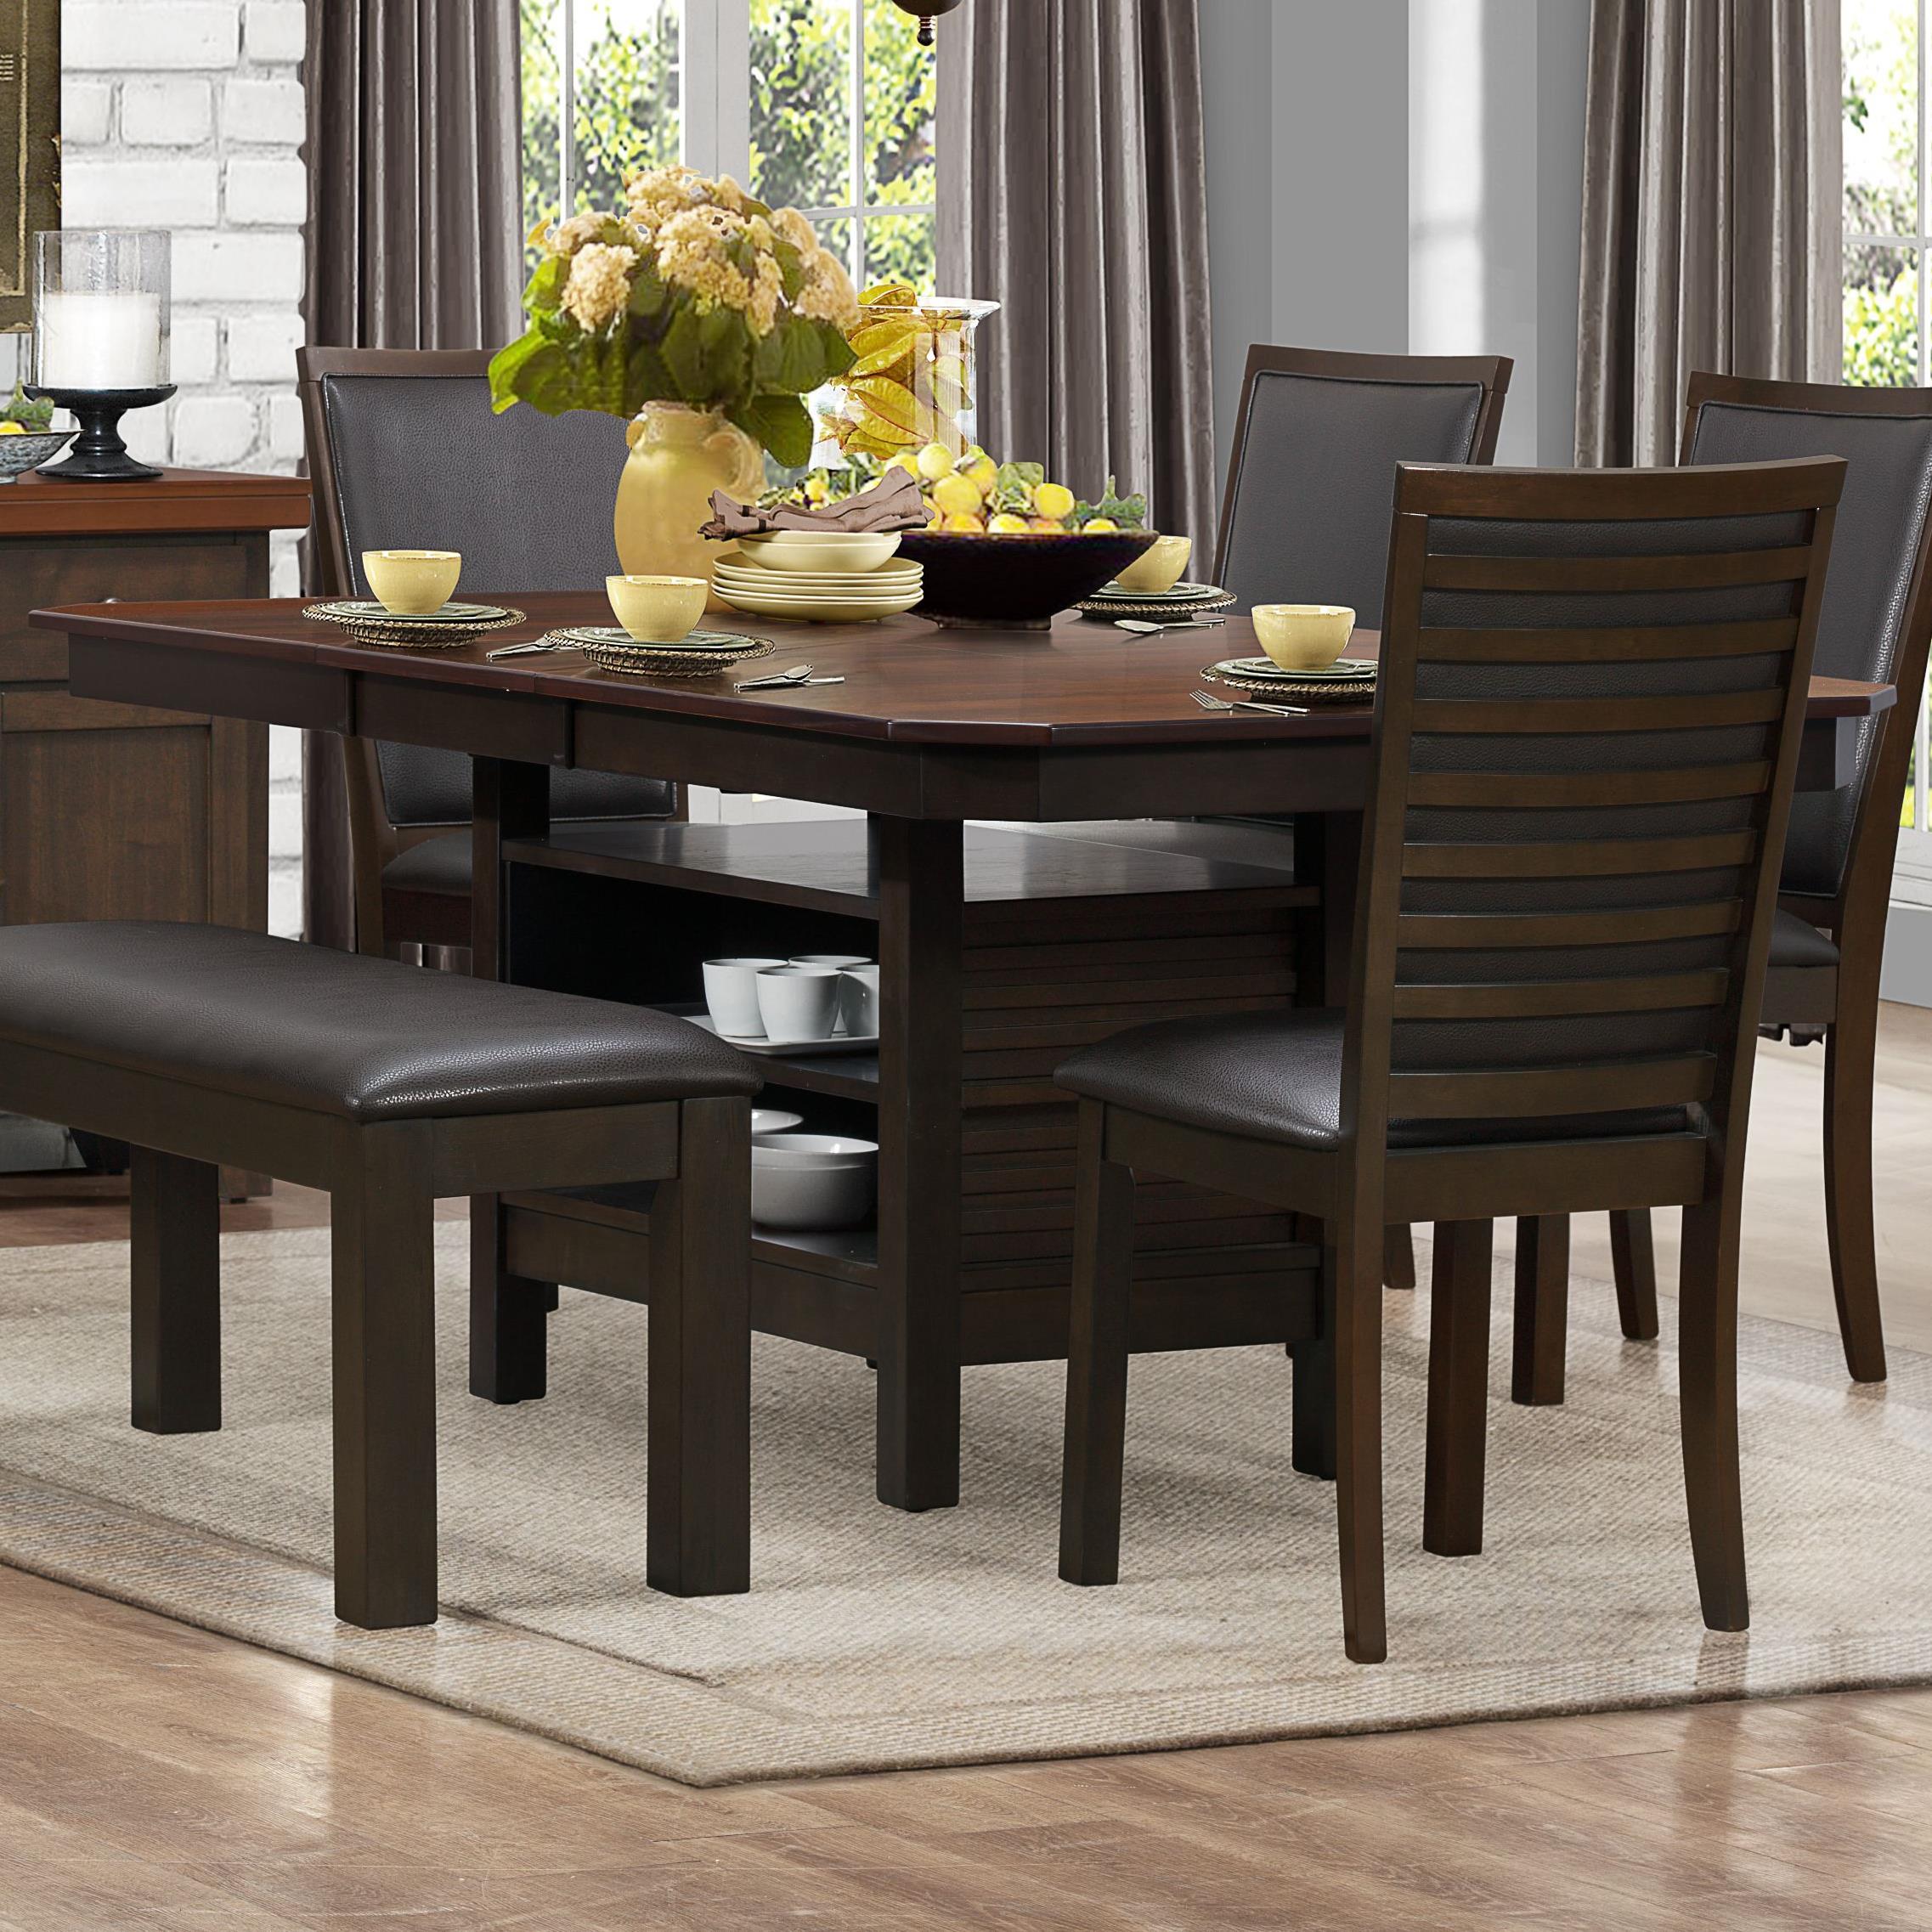 Homelegance Corliss Dining Table with Pedestal - Item Number: 5136-78B+78